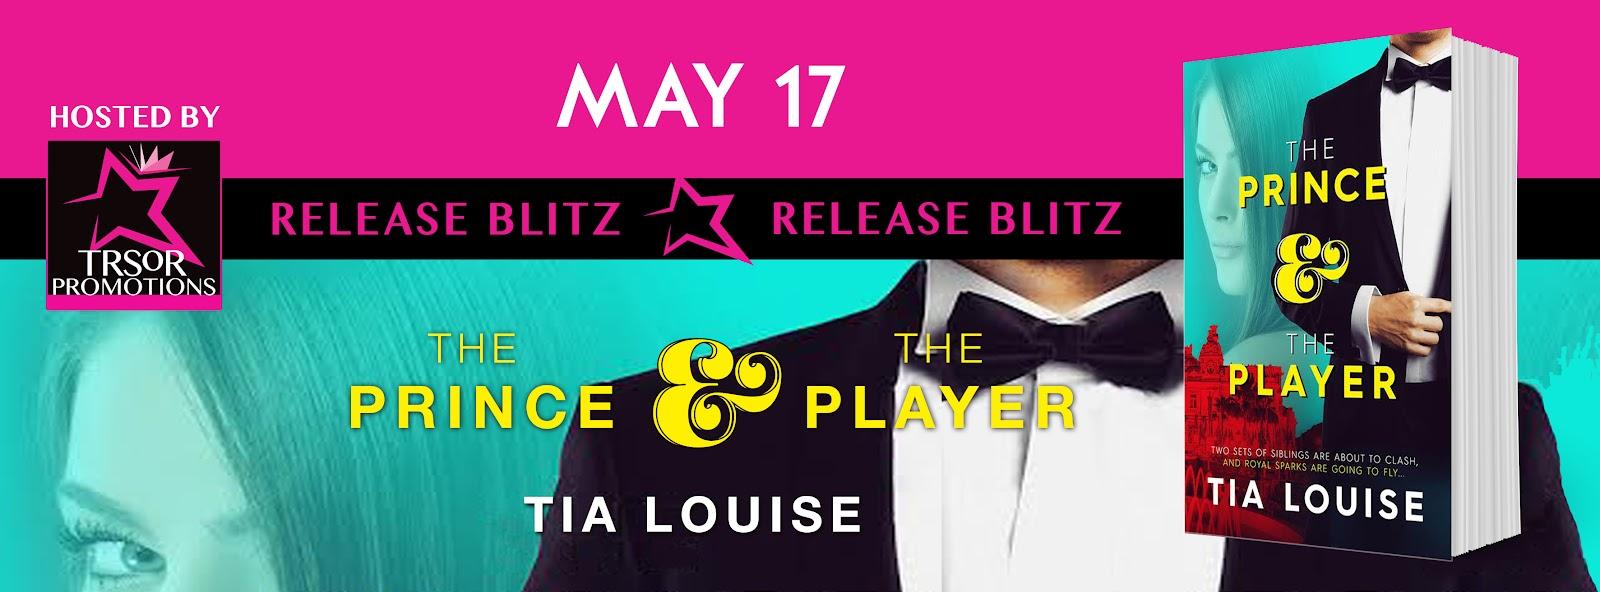 PRINCE&PLAYER_RELEASE_BLITZ.jpg